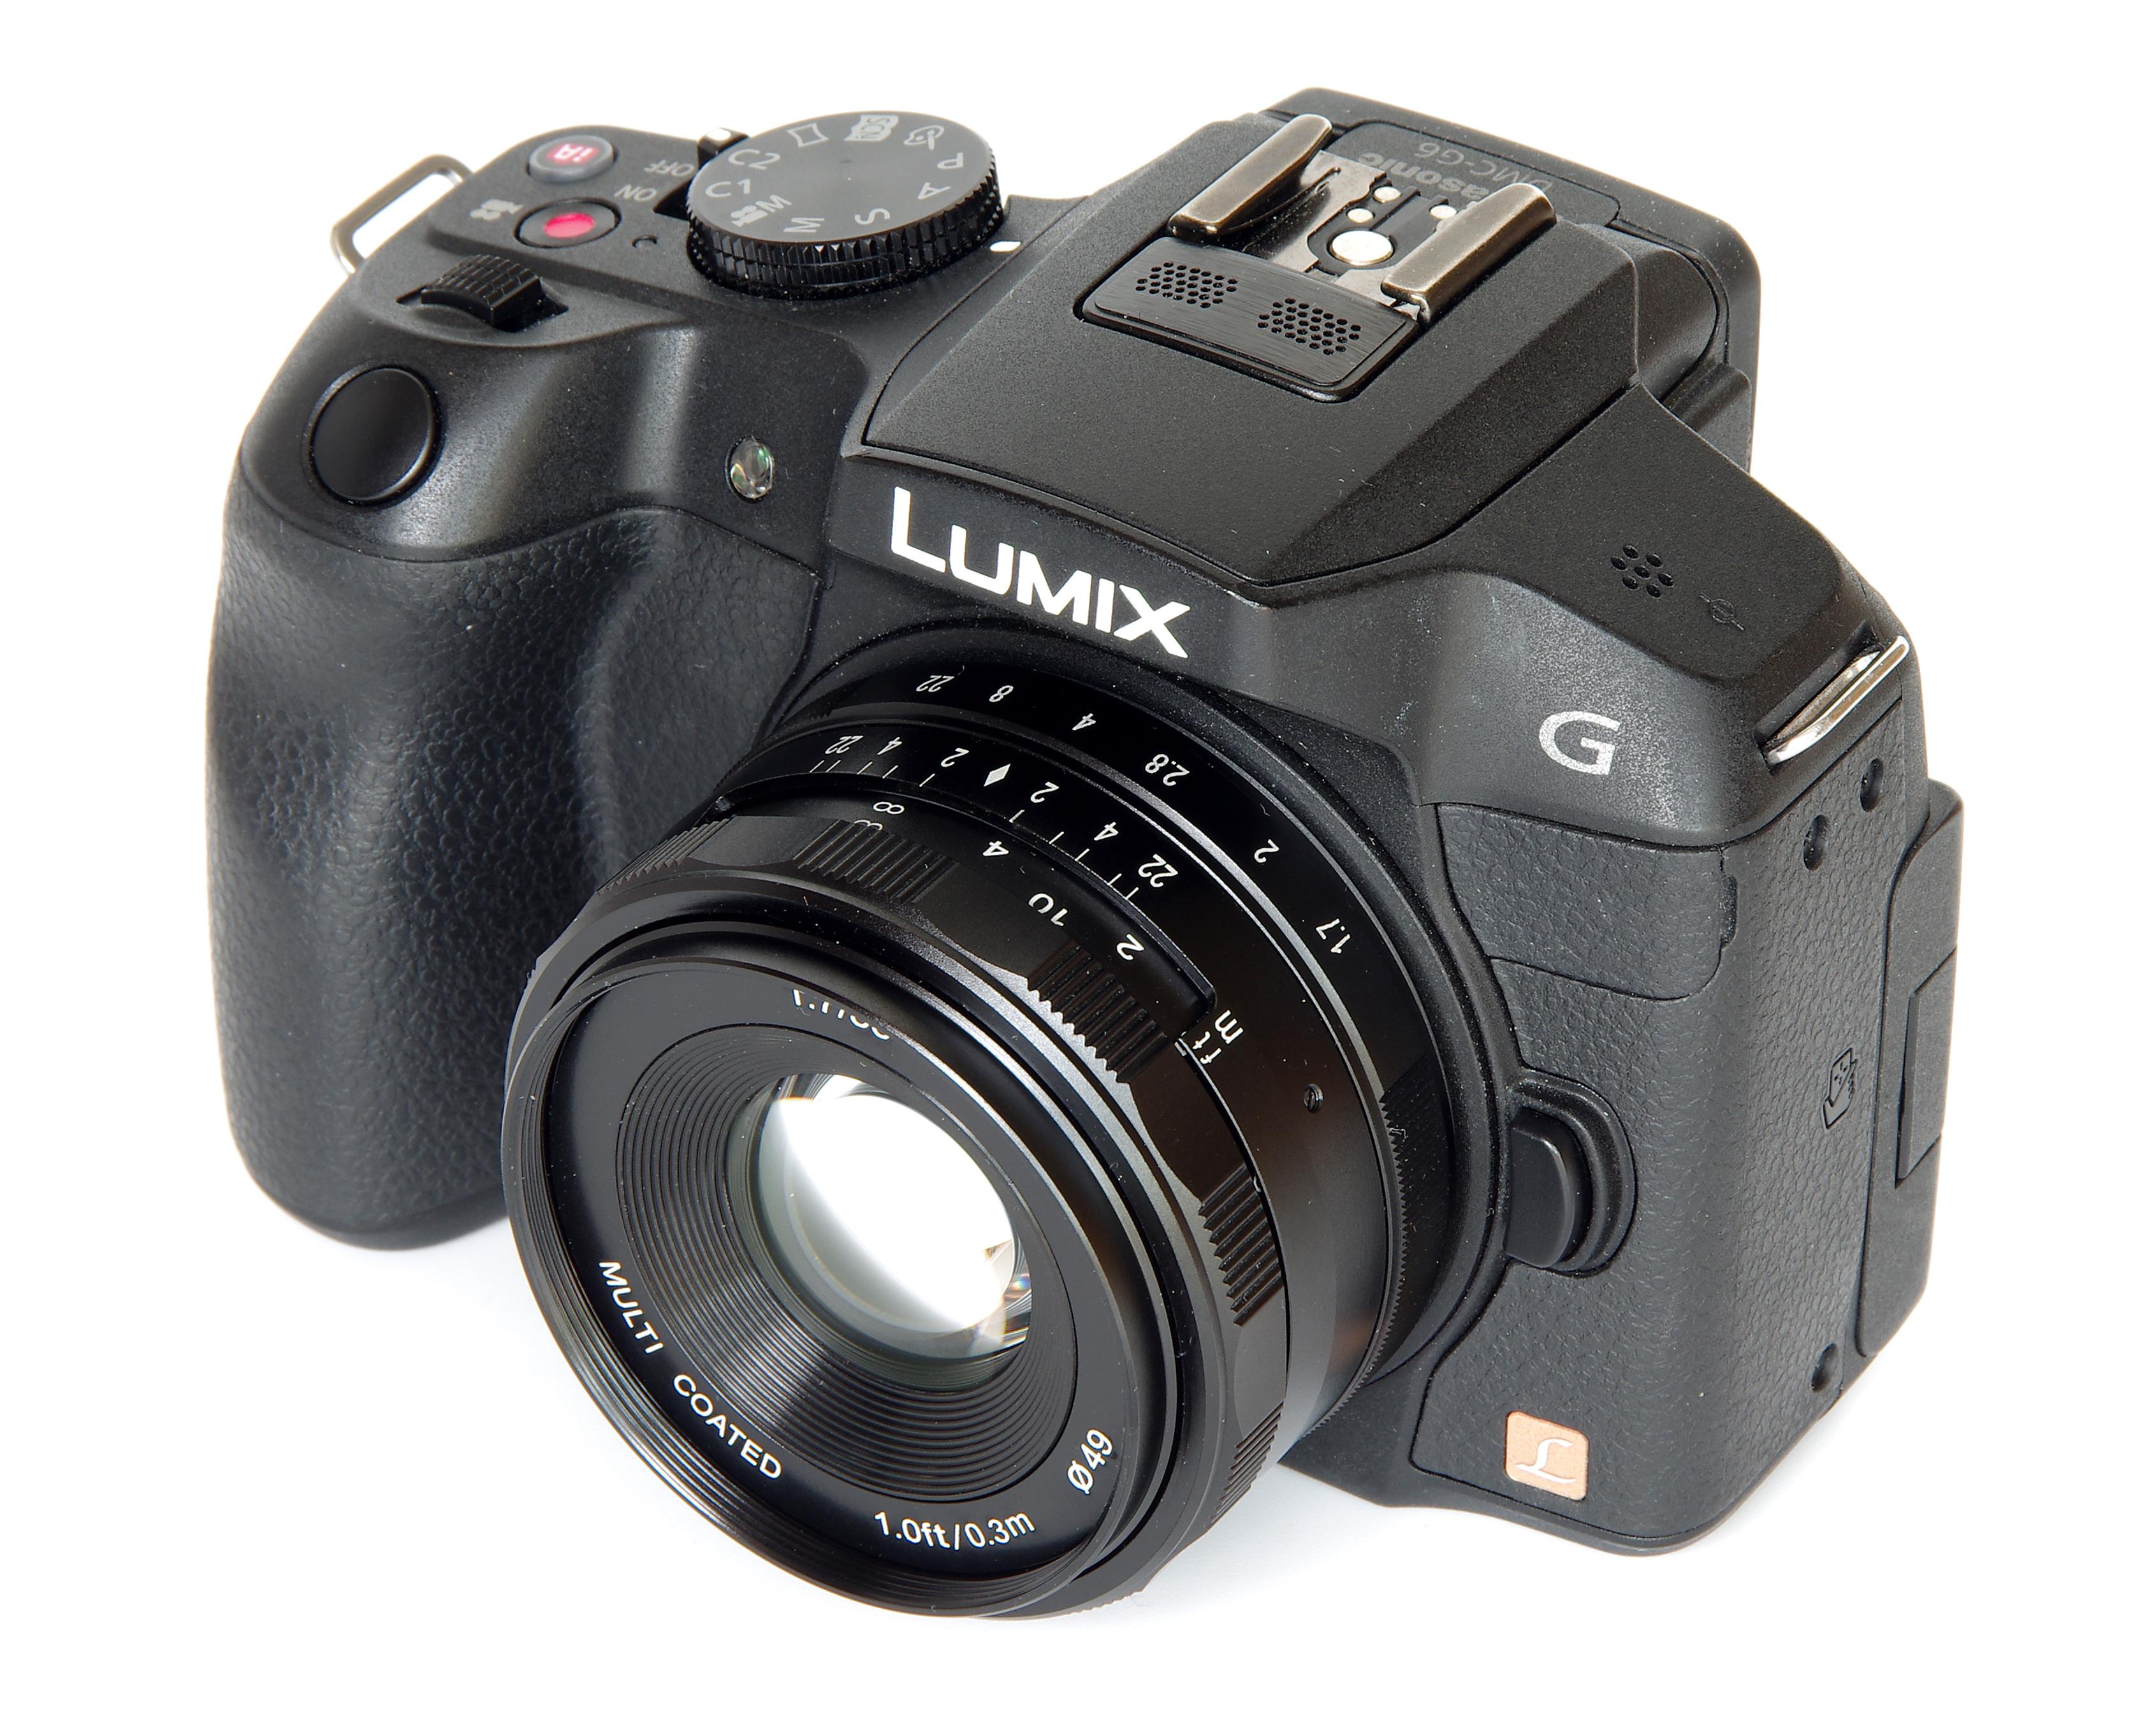 Meike 35mm f/1 7 Lens Review   ePHOTOzine